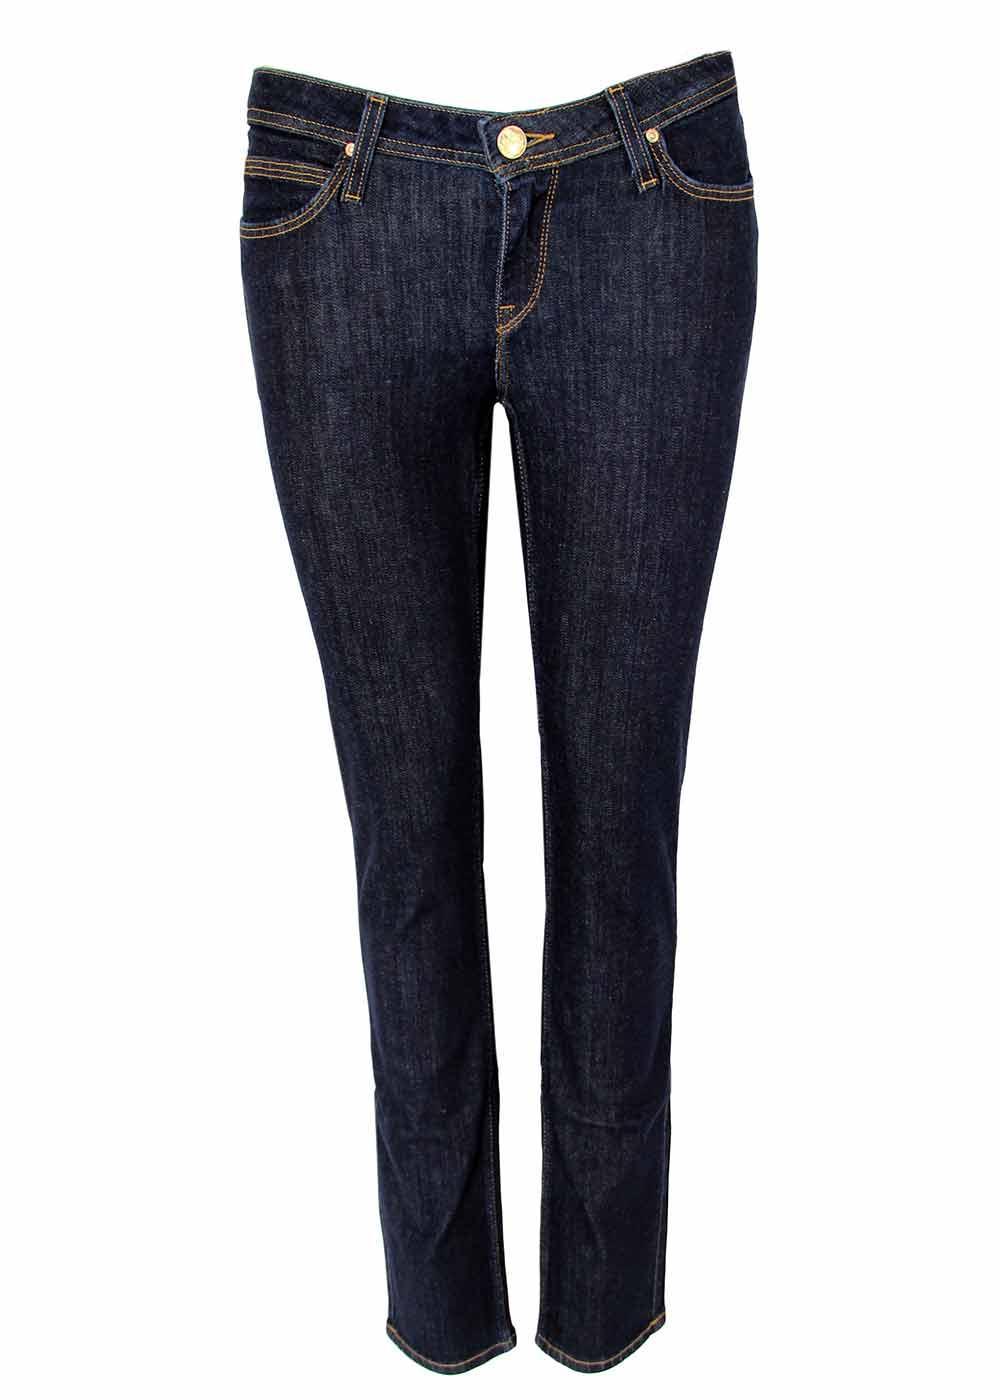 emlyn lee retro indie straight tapered fit denim jeans one wash. Black Bedroom Furniture Sets. Home Design Ideas